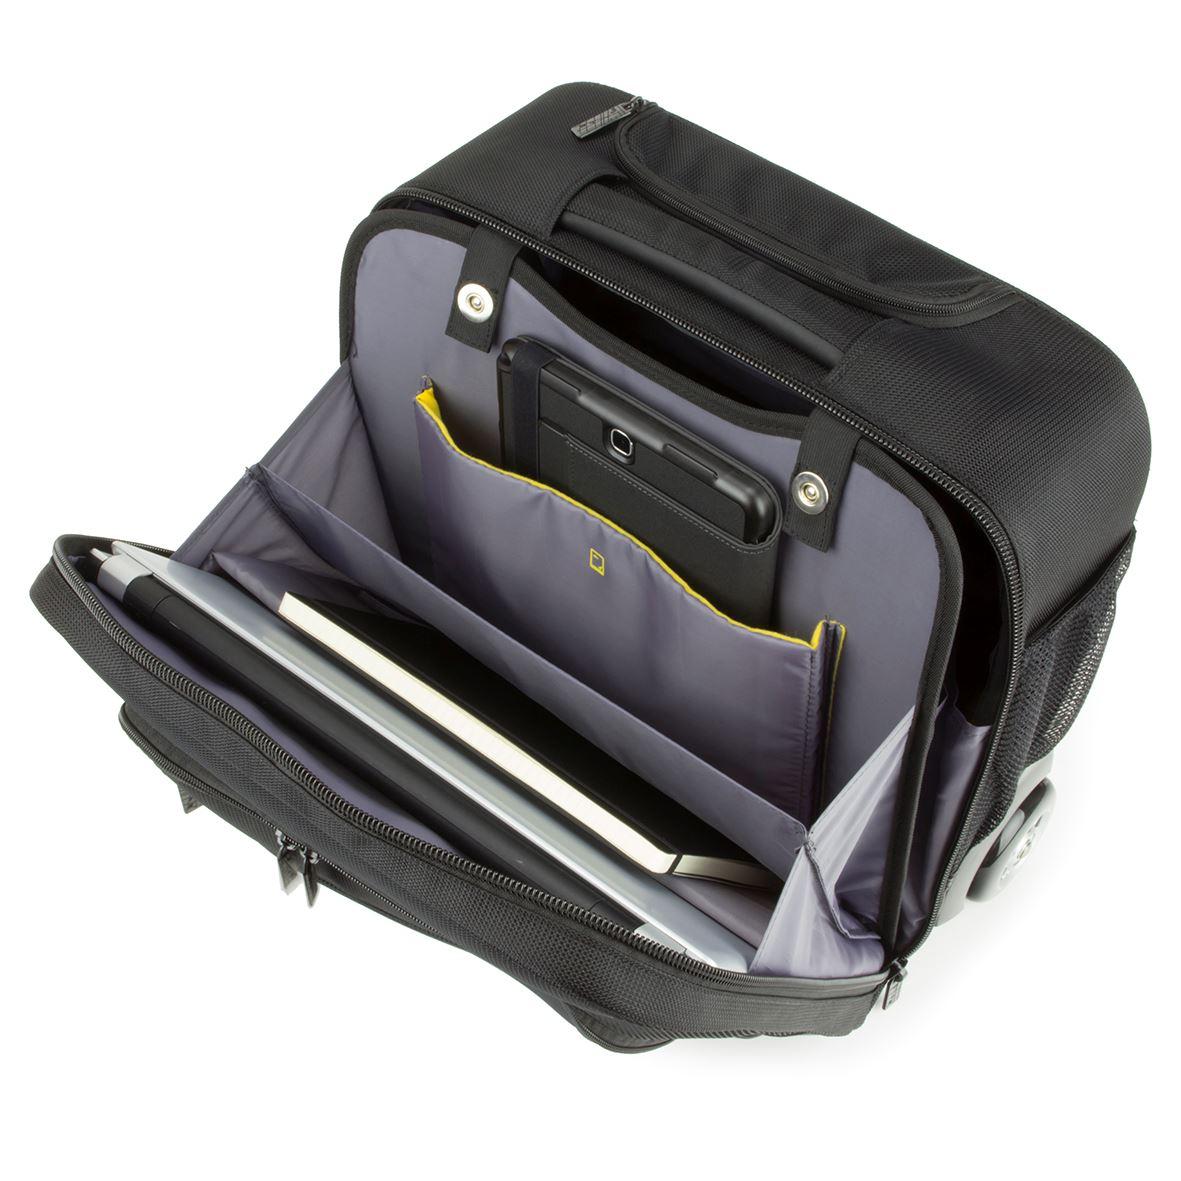 malette a roulette bagagerie valise sac de sport sac dos. Black Bedroom Furniture Sets. Home Design Ideas